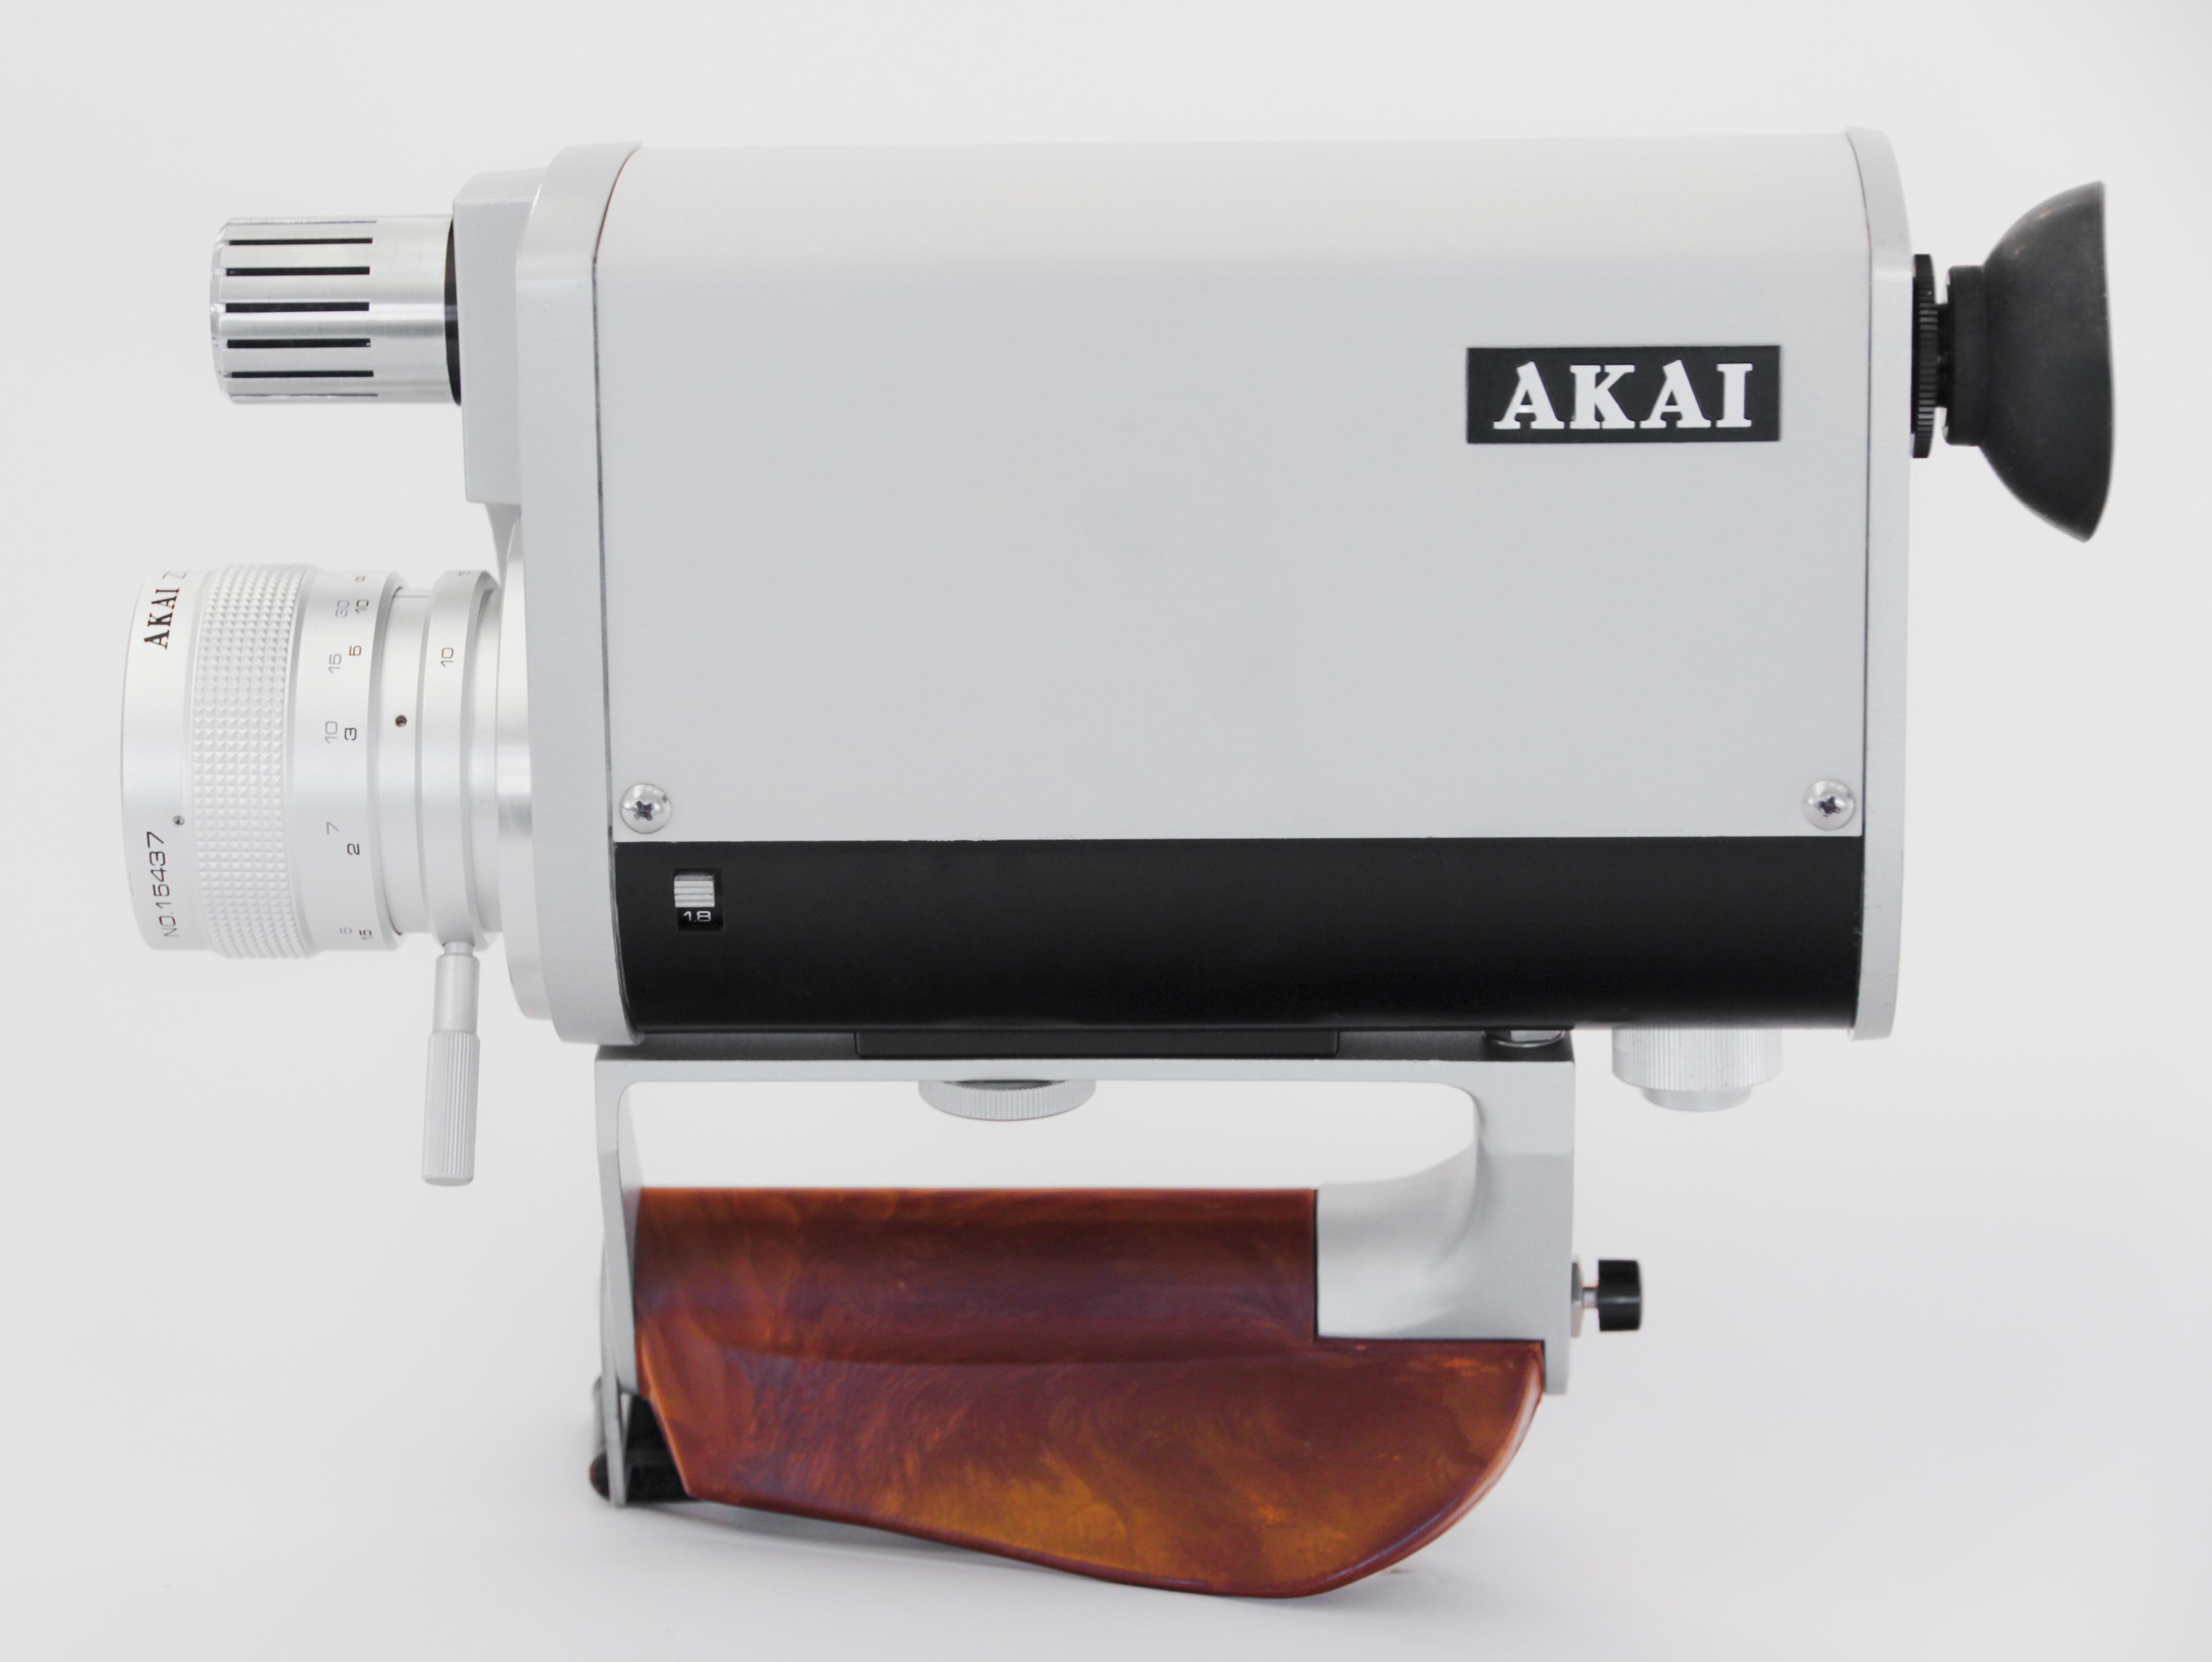 Akai VC-100